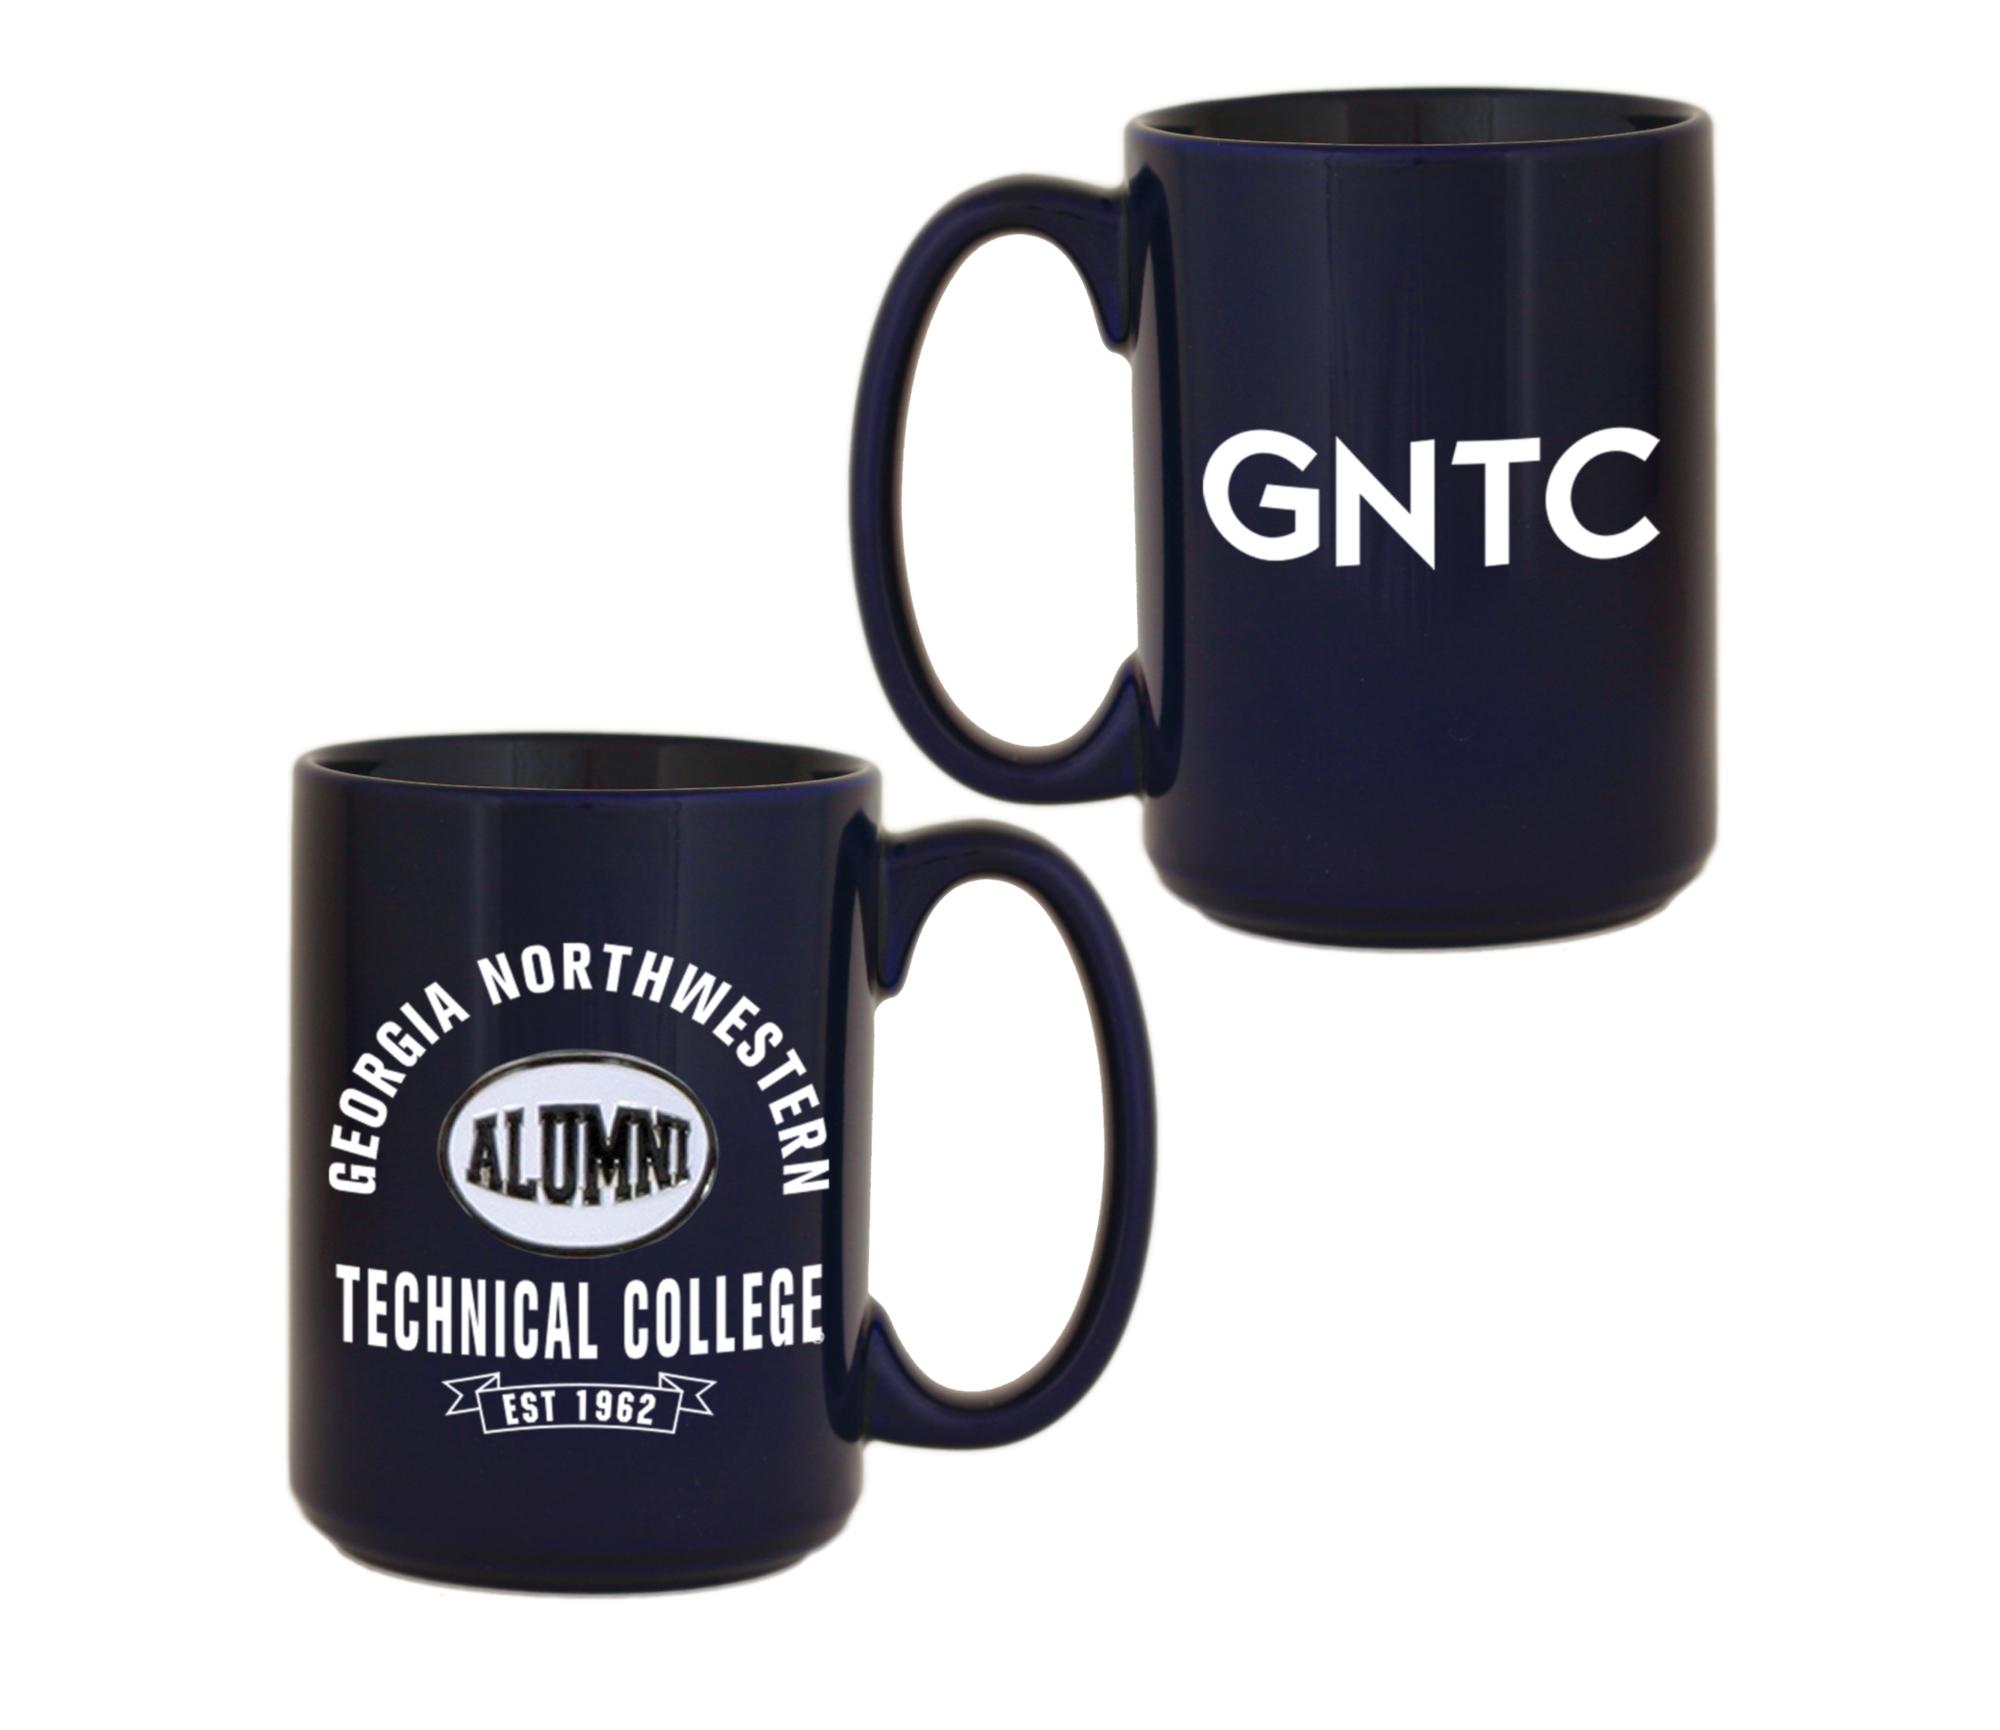 GNTC Est. 1962 Alumni Medallion Mug